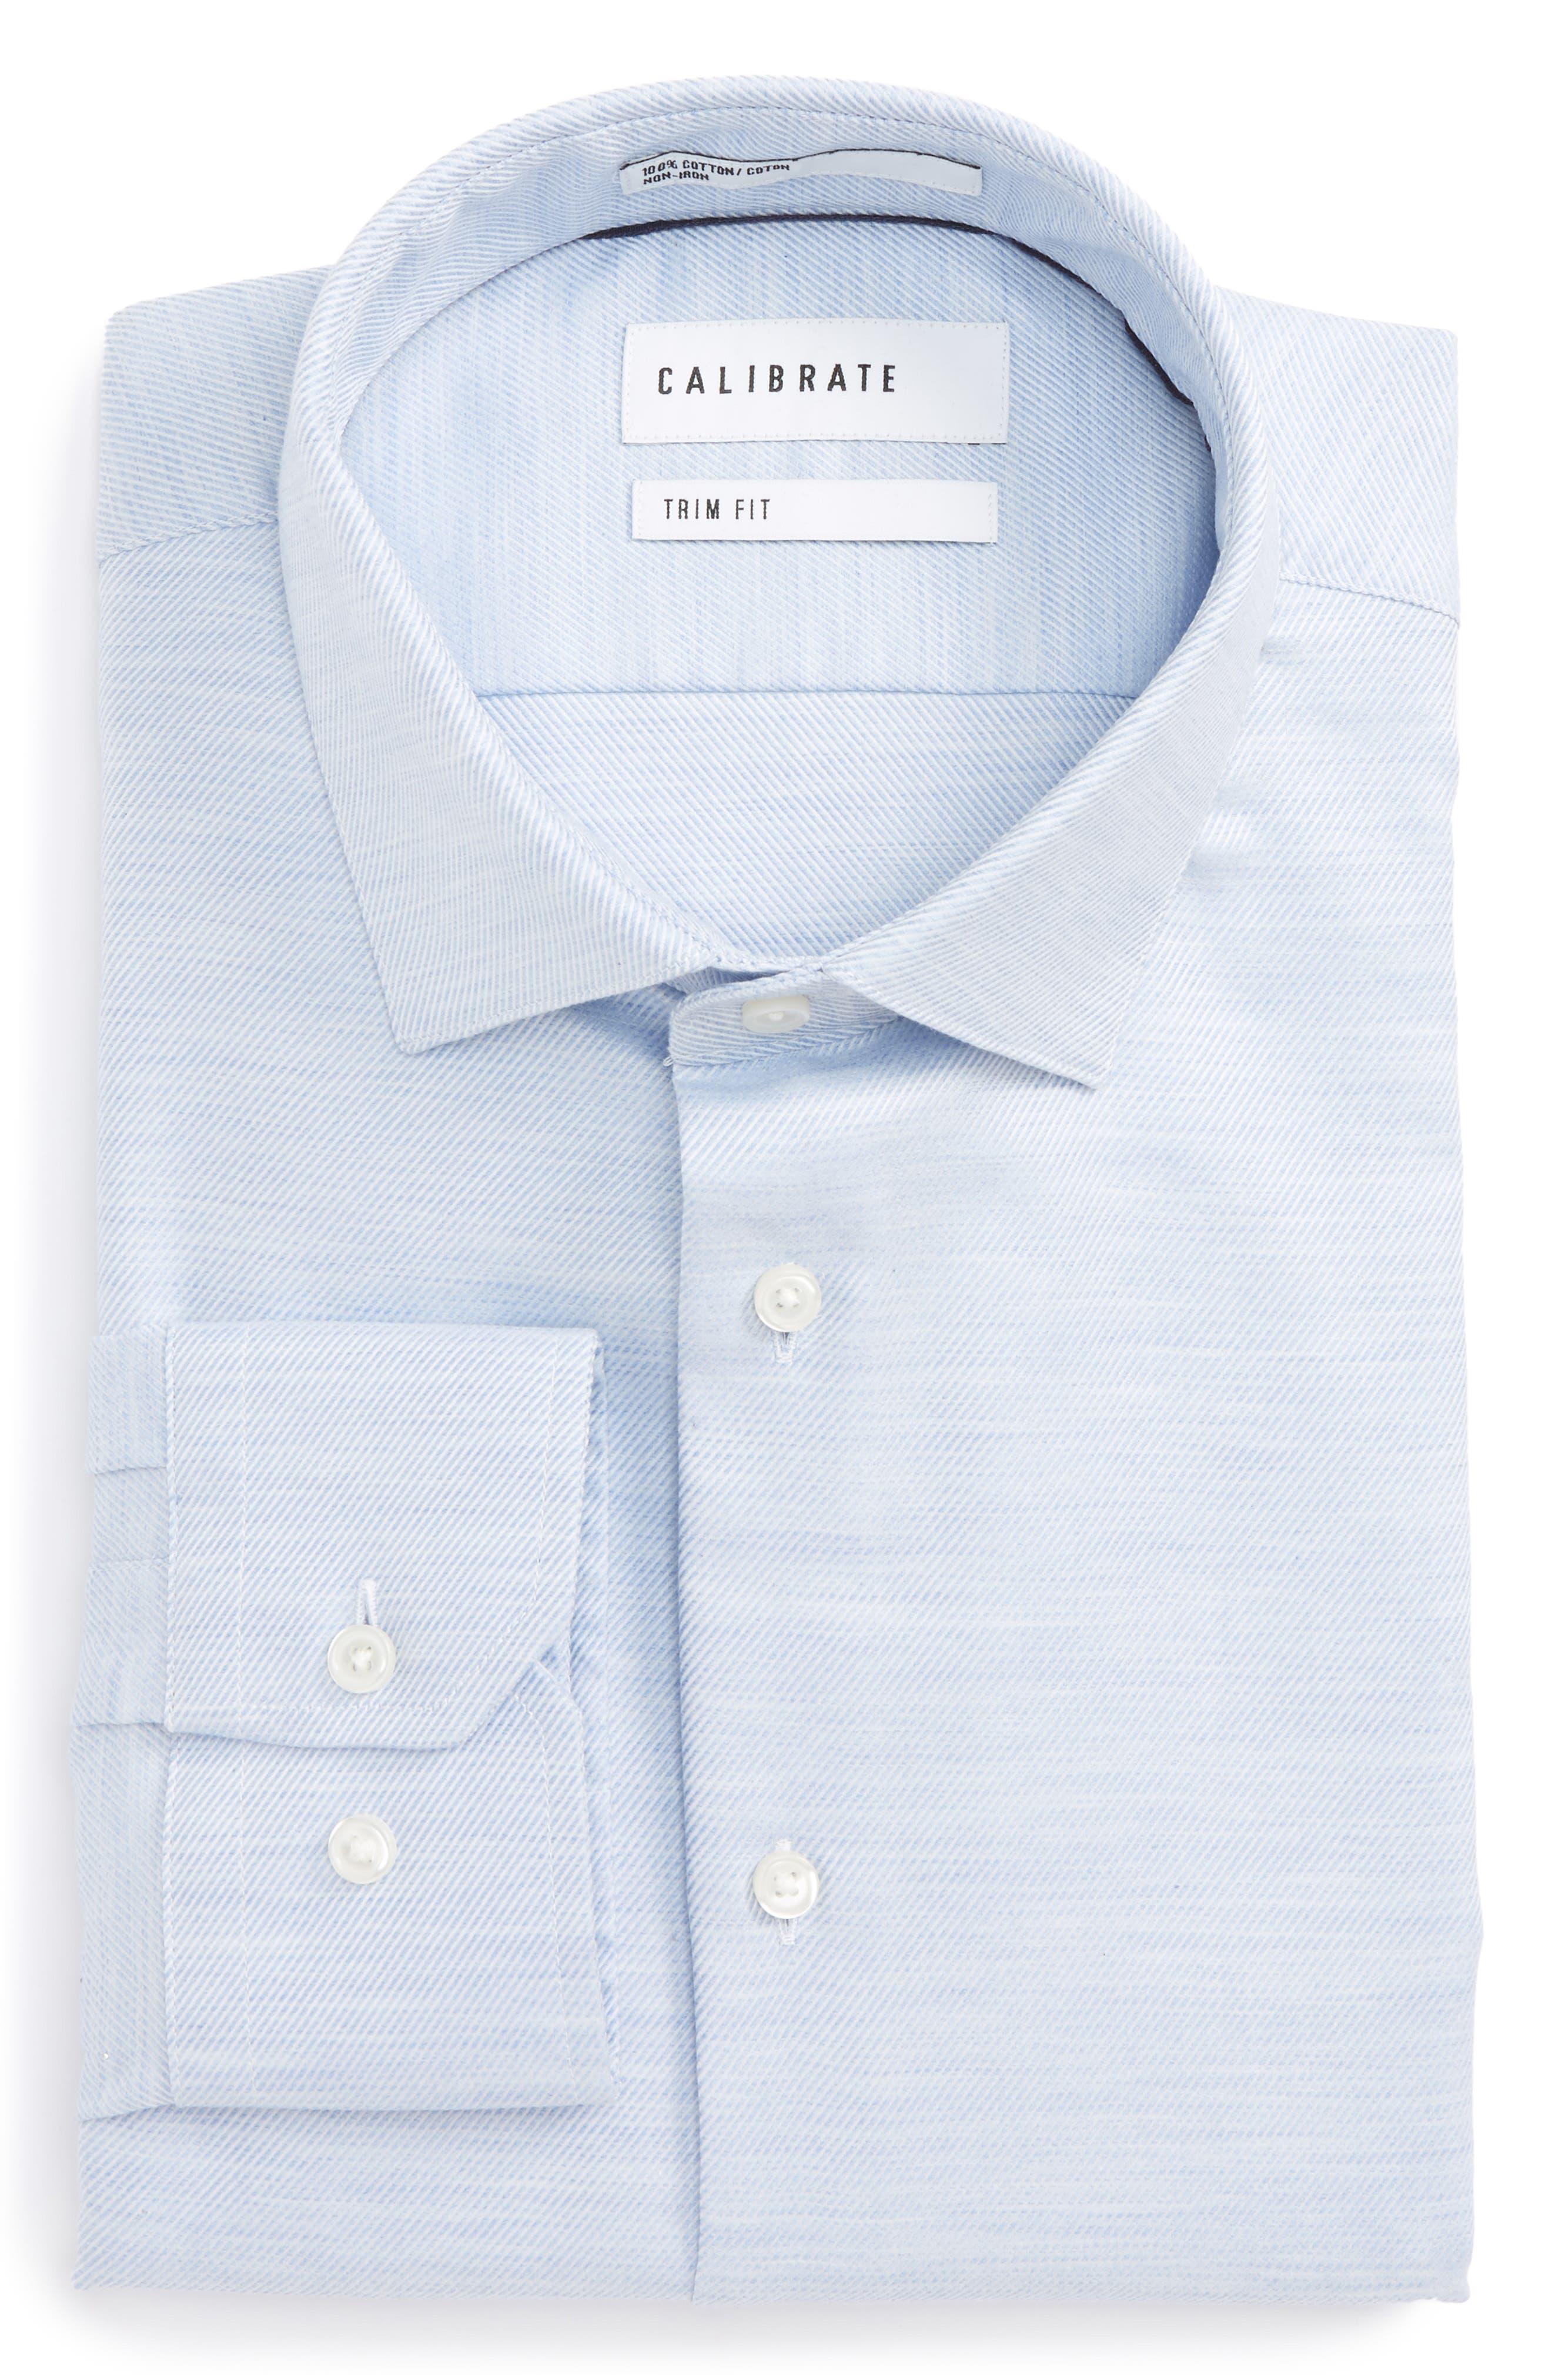 Main Image - Calibrate Trim Fit Twill Dress Shirt